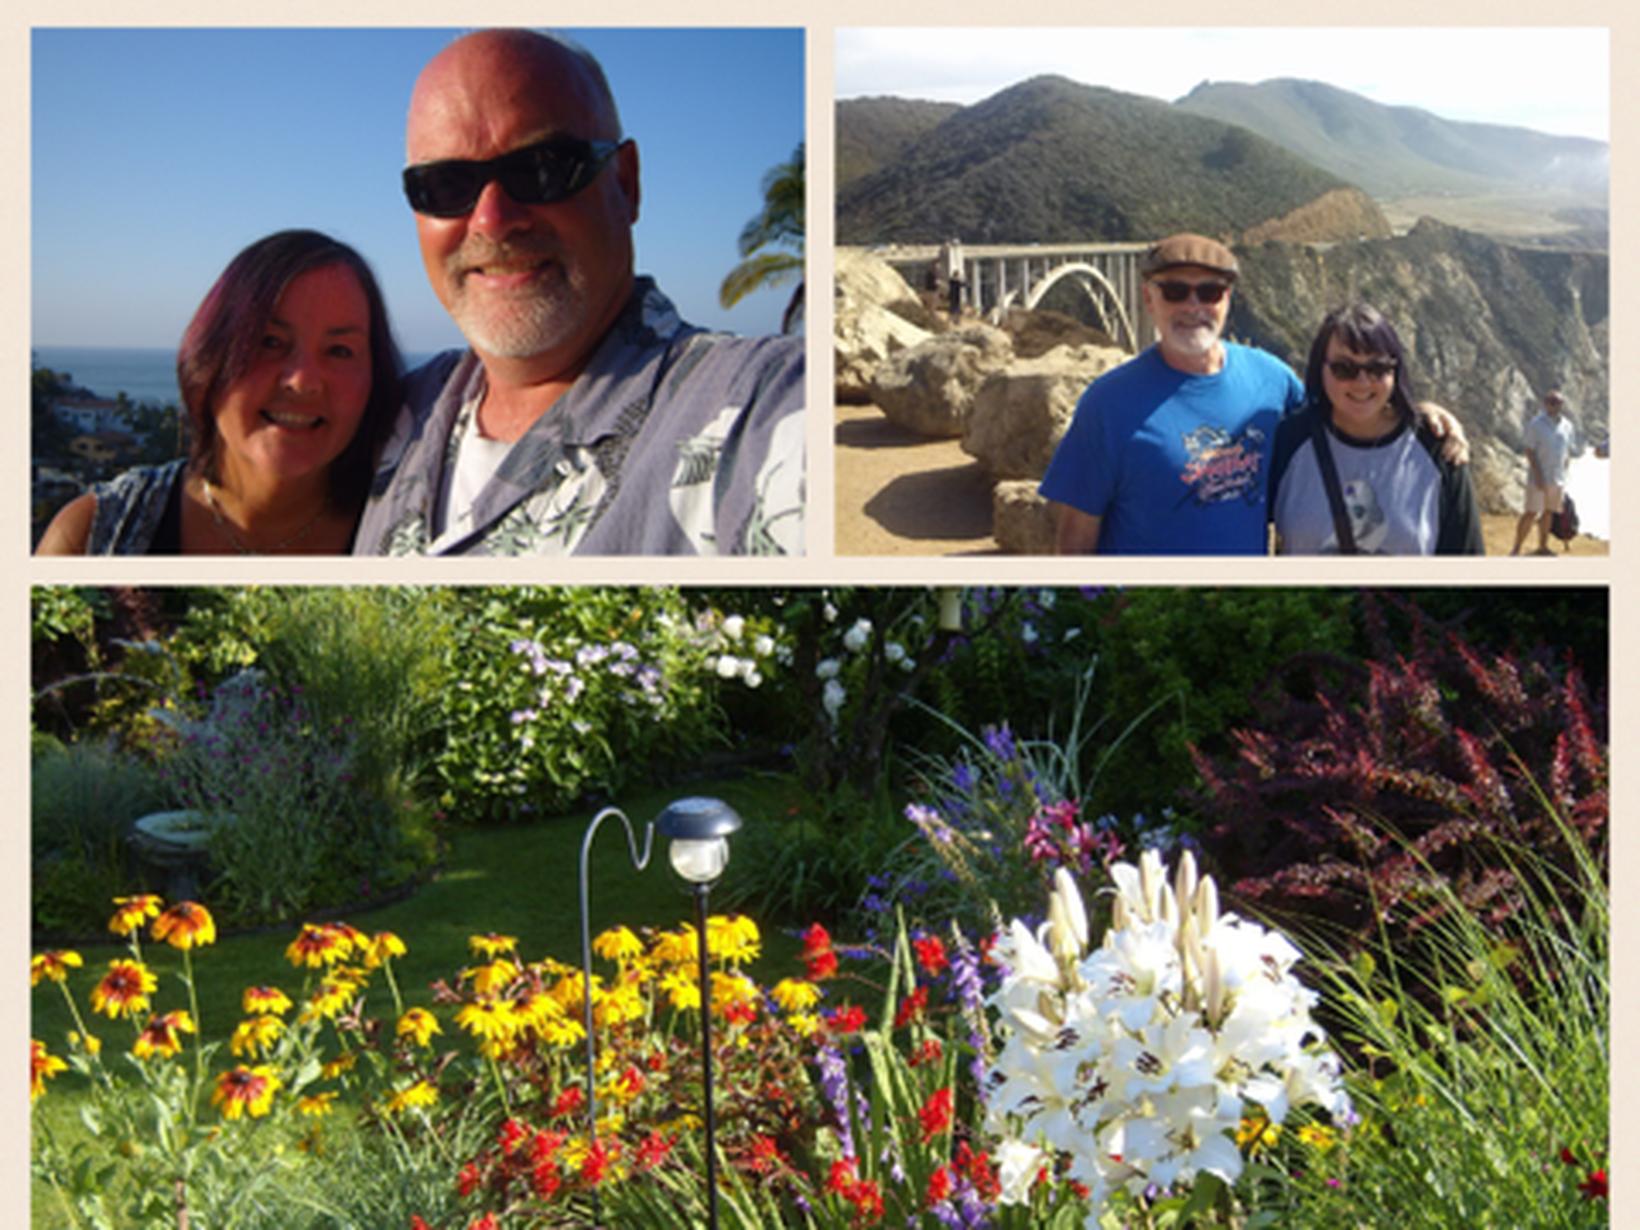 Glen & Sandie from Squamish, British Columbia, Canada